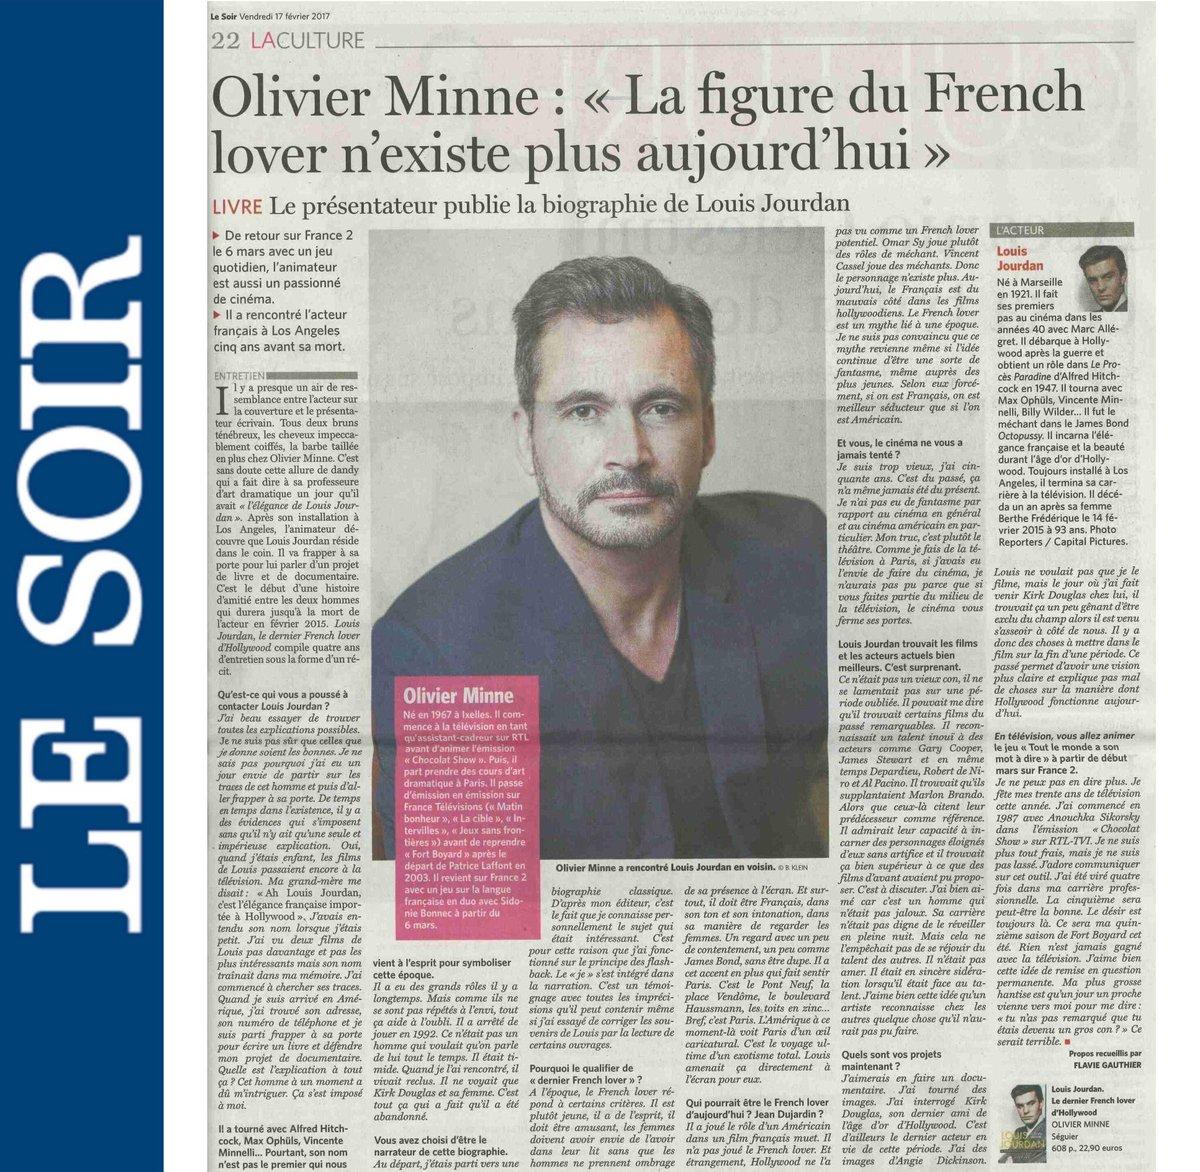 Merci à @FlavieGothie pour ce très bel article sur @louisjourdanoff @lesoir #frenchlover #hollywood #louisjourdan<br>http://pic.twitter.com/HwOxMsTeEL